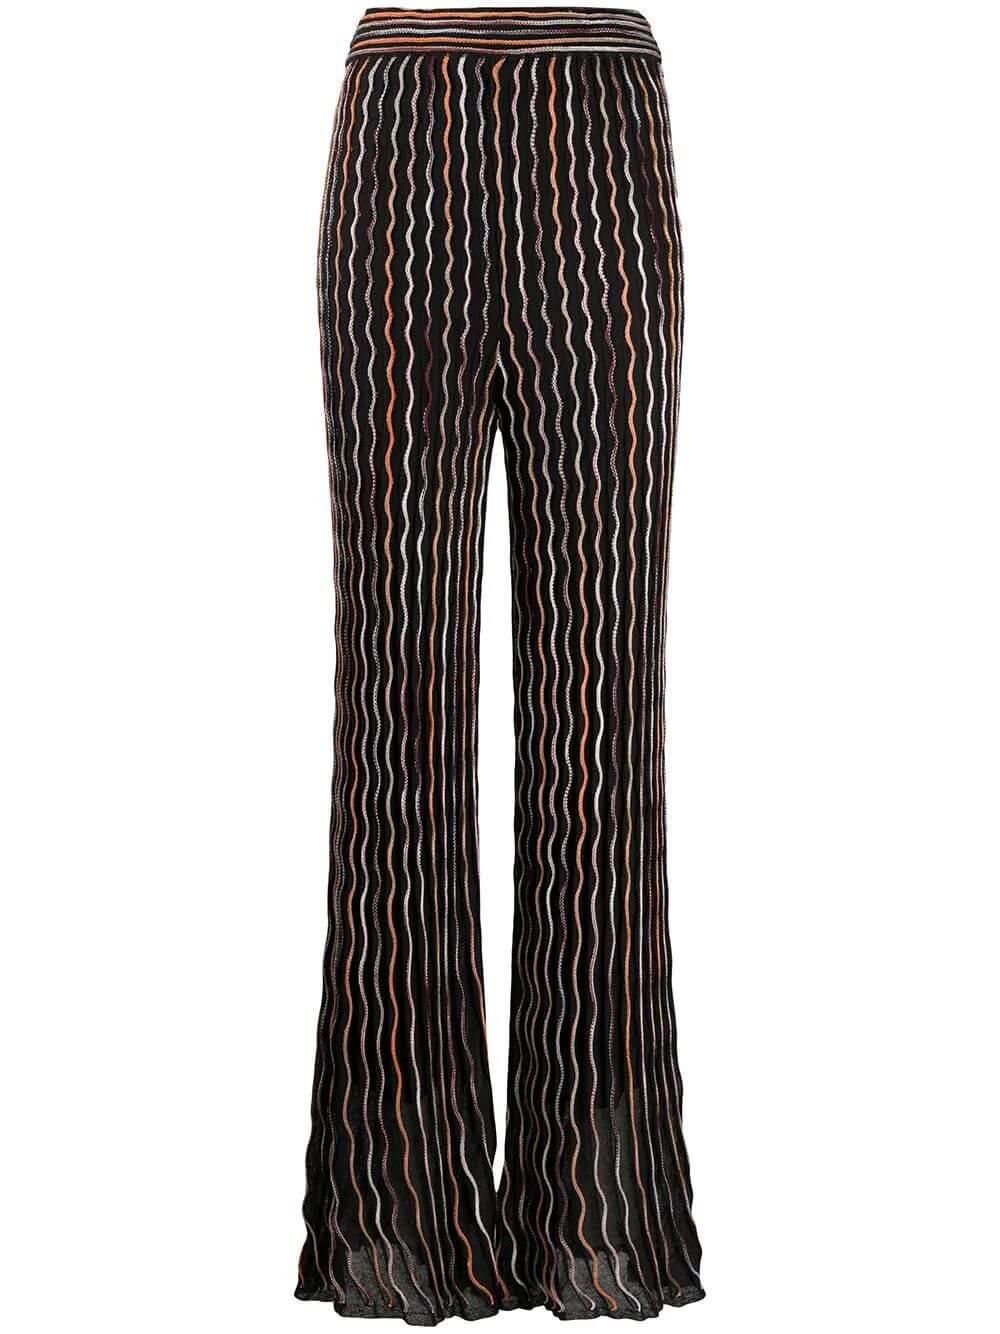 Wave Pattern Knit Pants Item # 2DI00209-2K006I